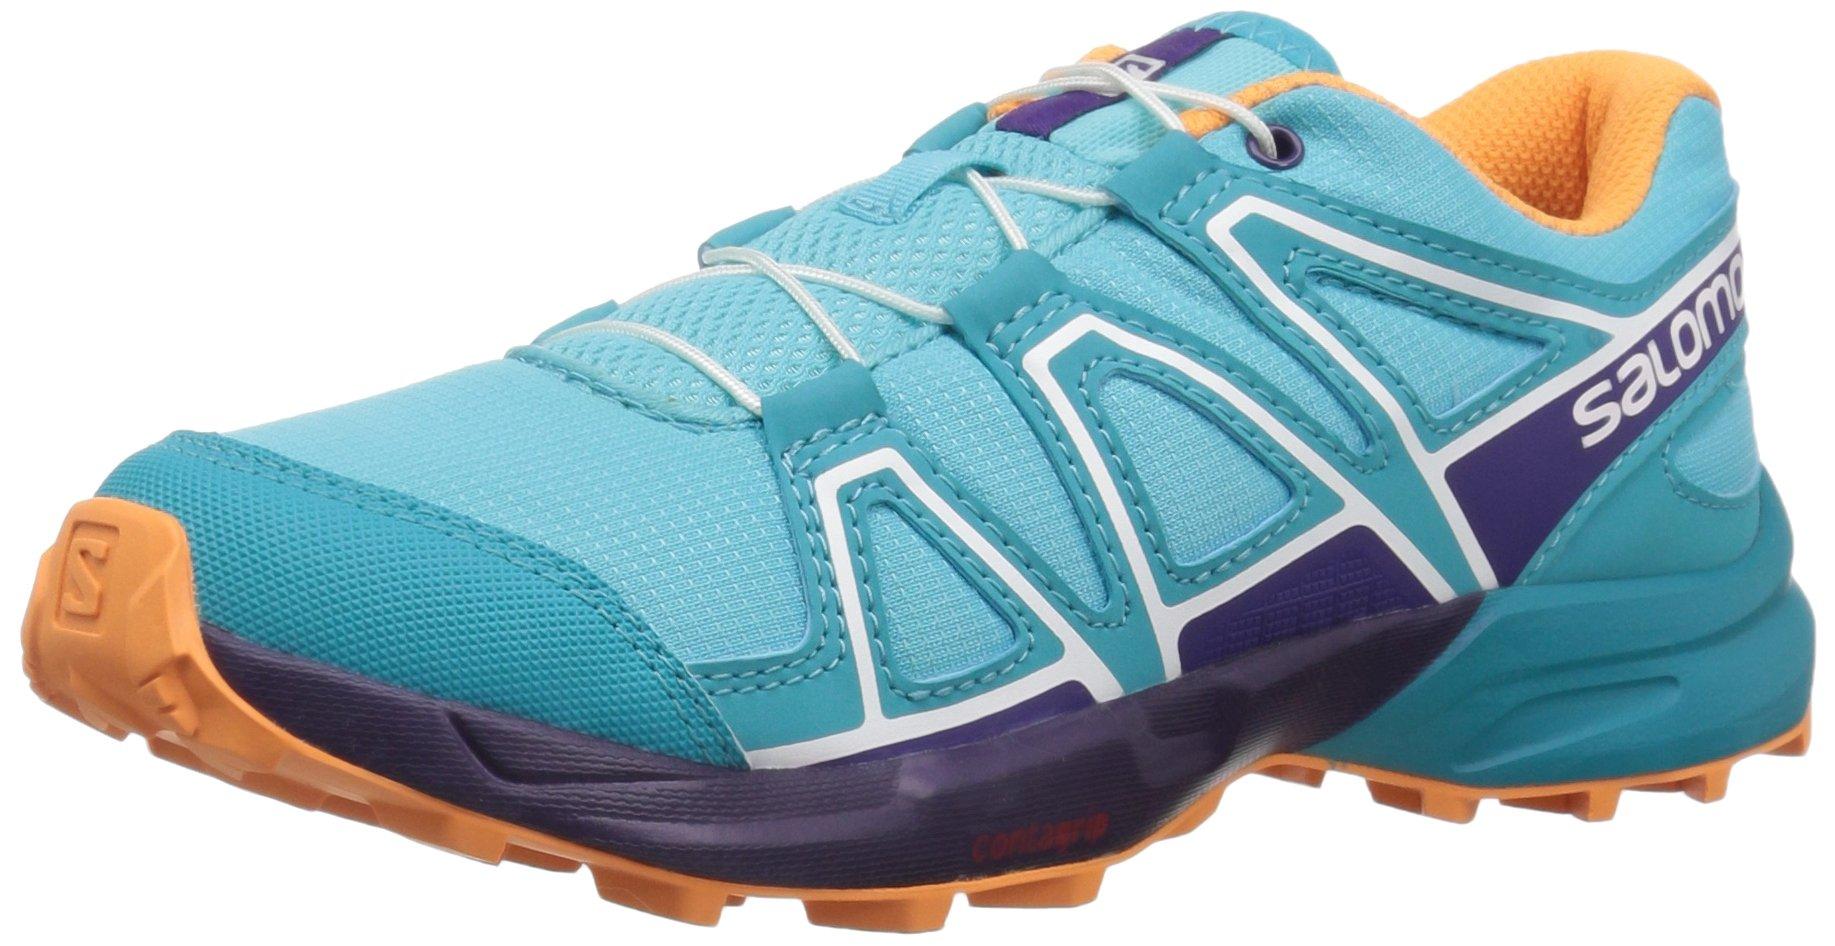 super popular b72f3 5a381 Salomon Kinder Speedcross J, Trailrunning-Schuhe, blau (blue curacao / acai  / bird of paradise), Größe 36